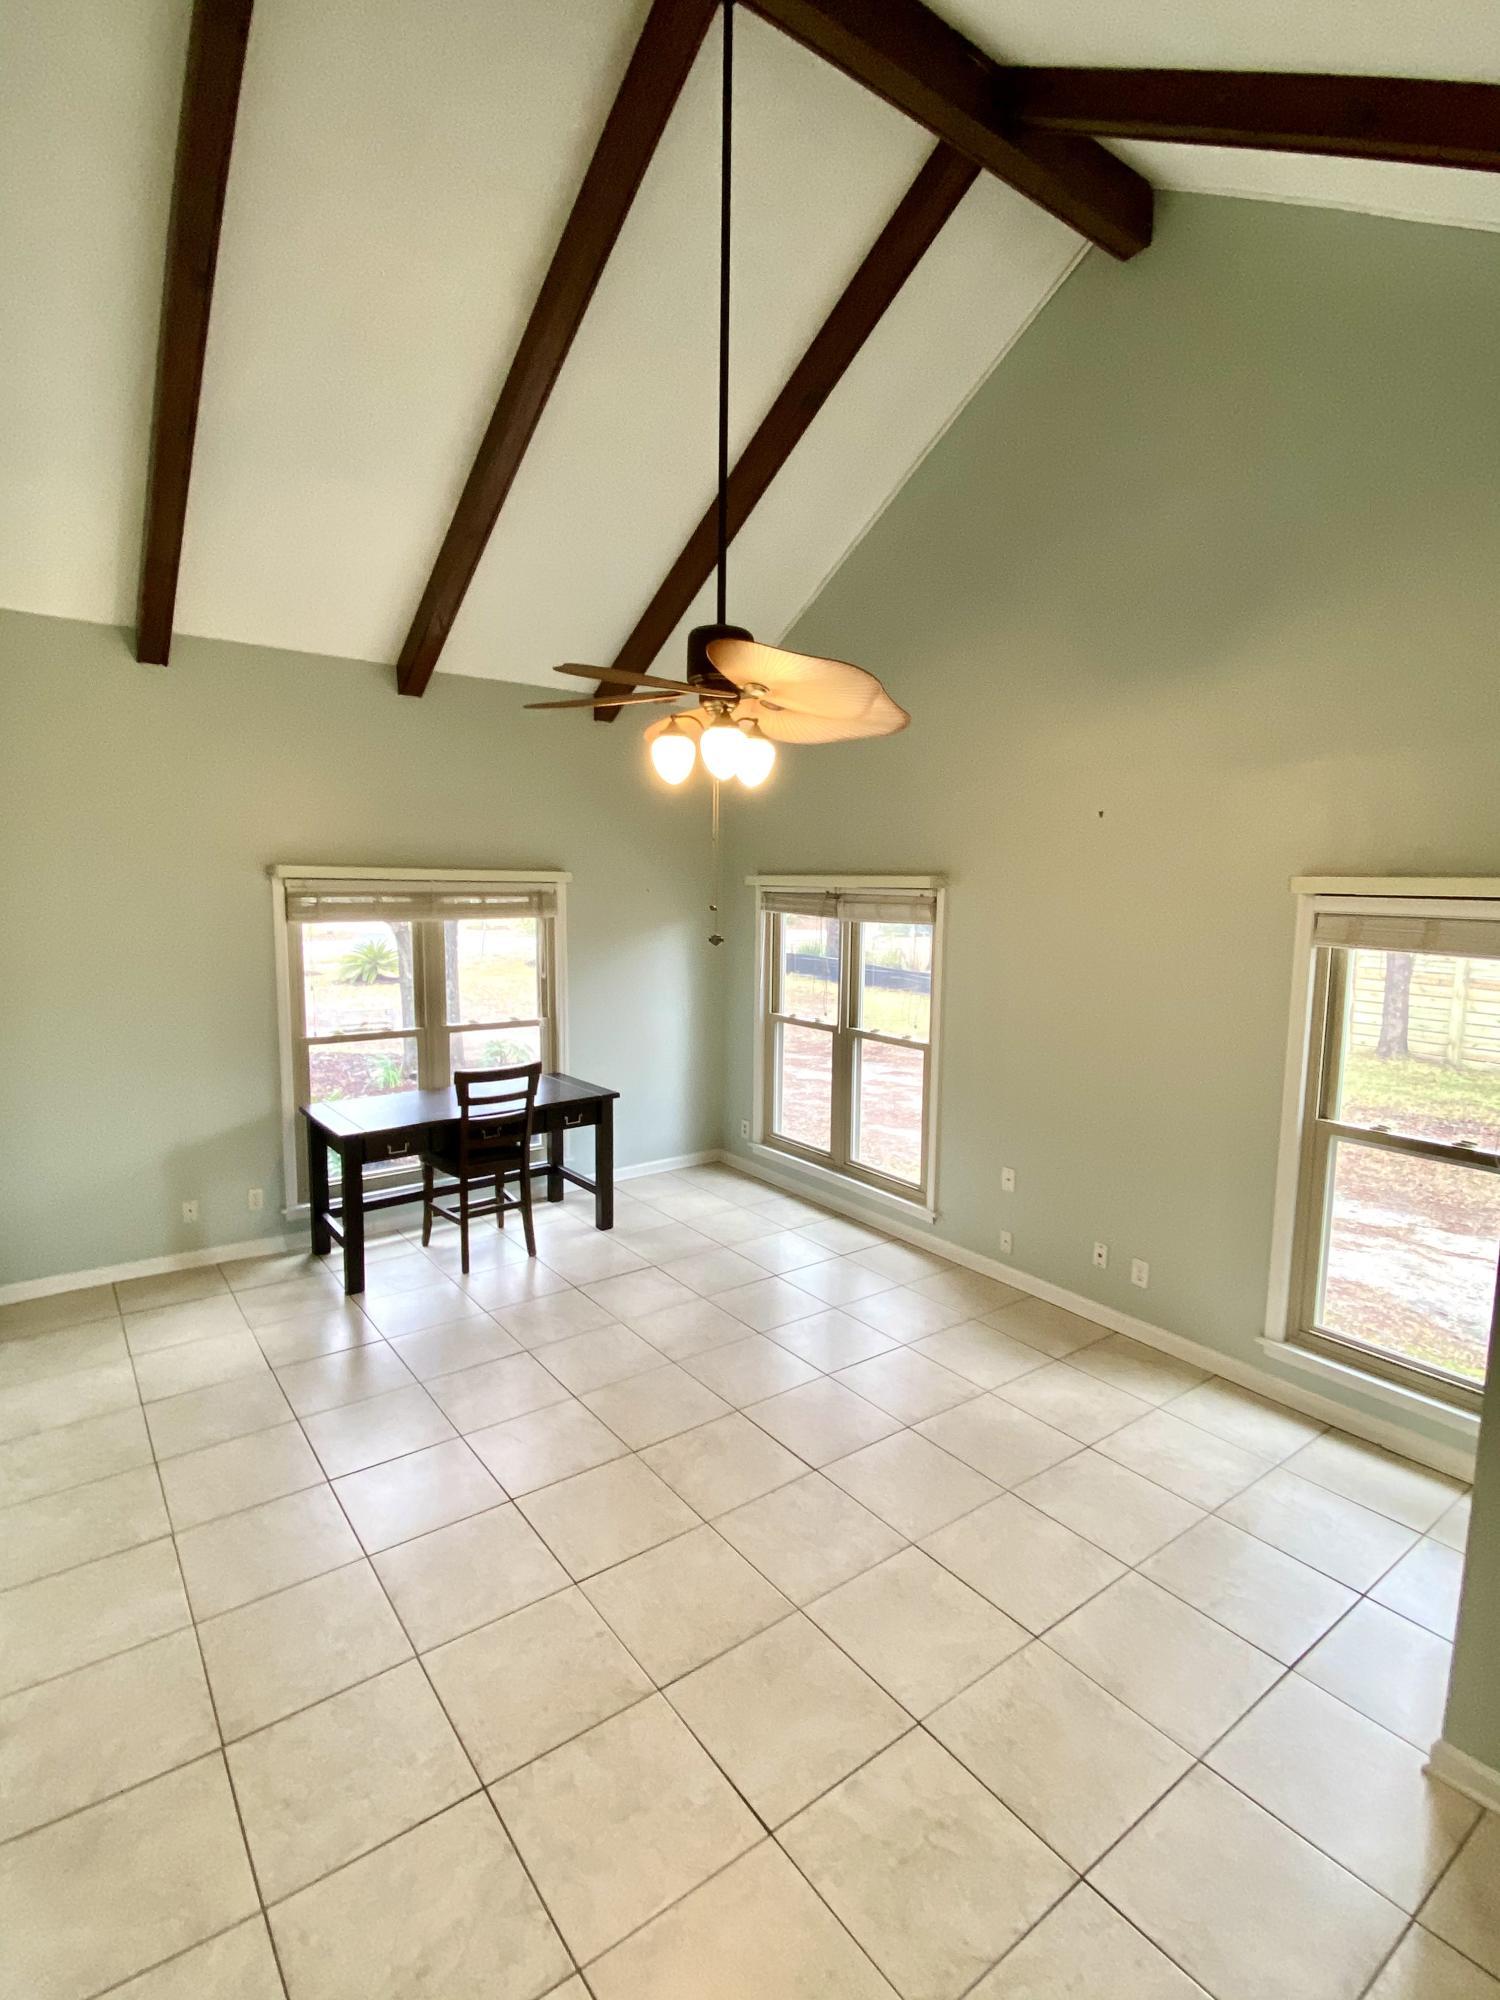 Palmetto Fort Homes For Sale - 1510 Lakeshore, Mount Pleasant, SC - 20